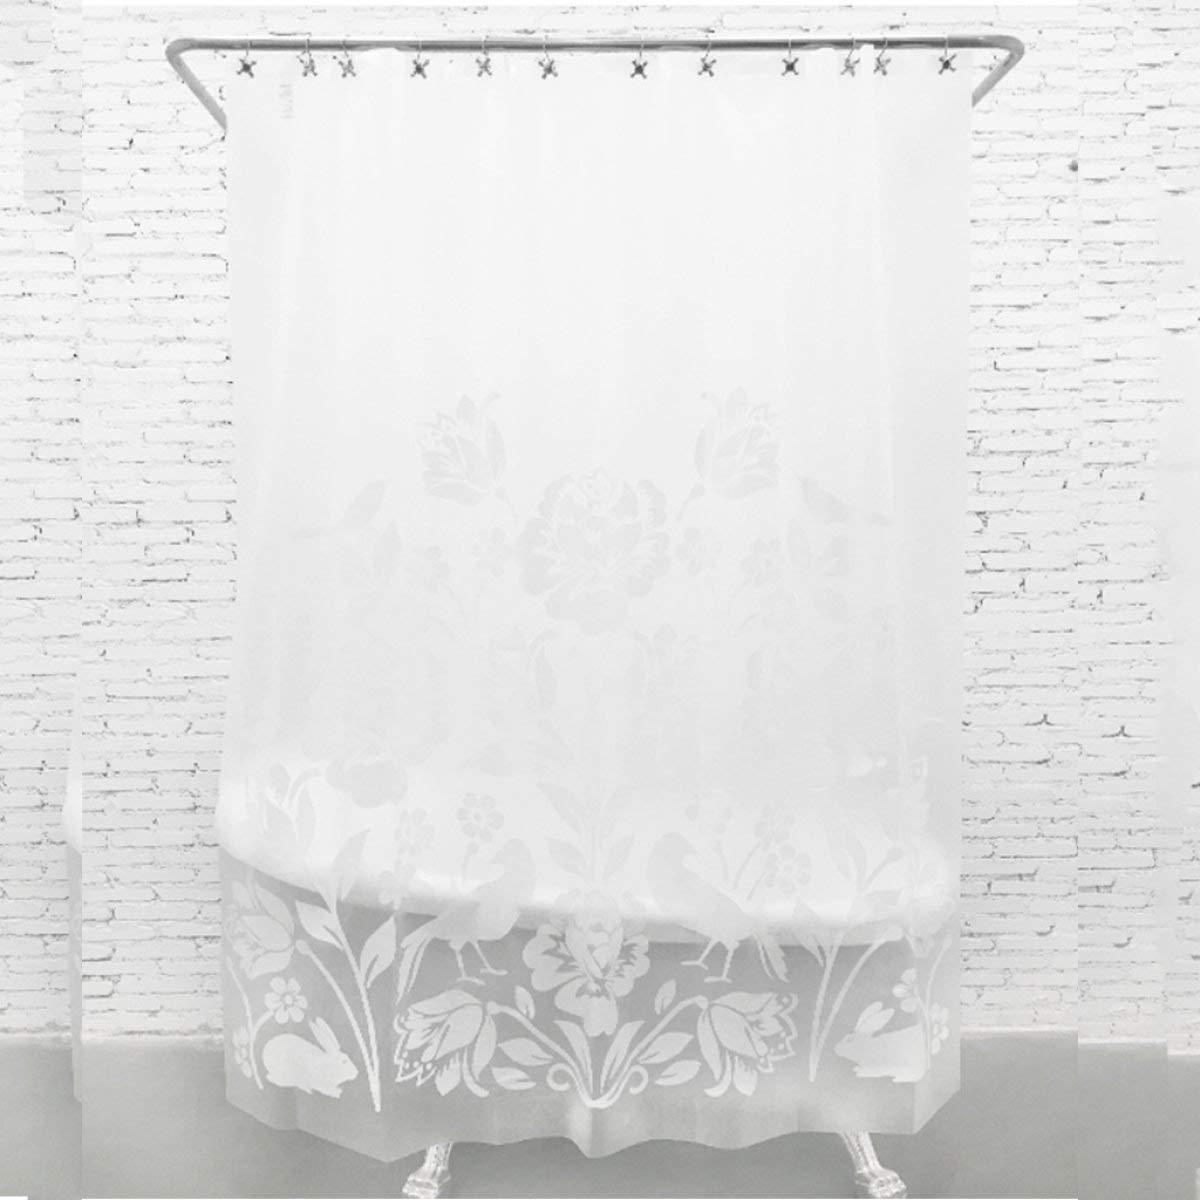 Der Innovative Paper Cutting Translucent Matt Blinds Thickening EVA Baths Free Punching Shower Curtains Antibacterial Mold Molds Bathroom Accessories